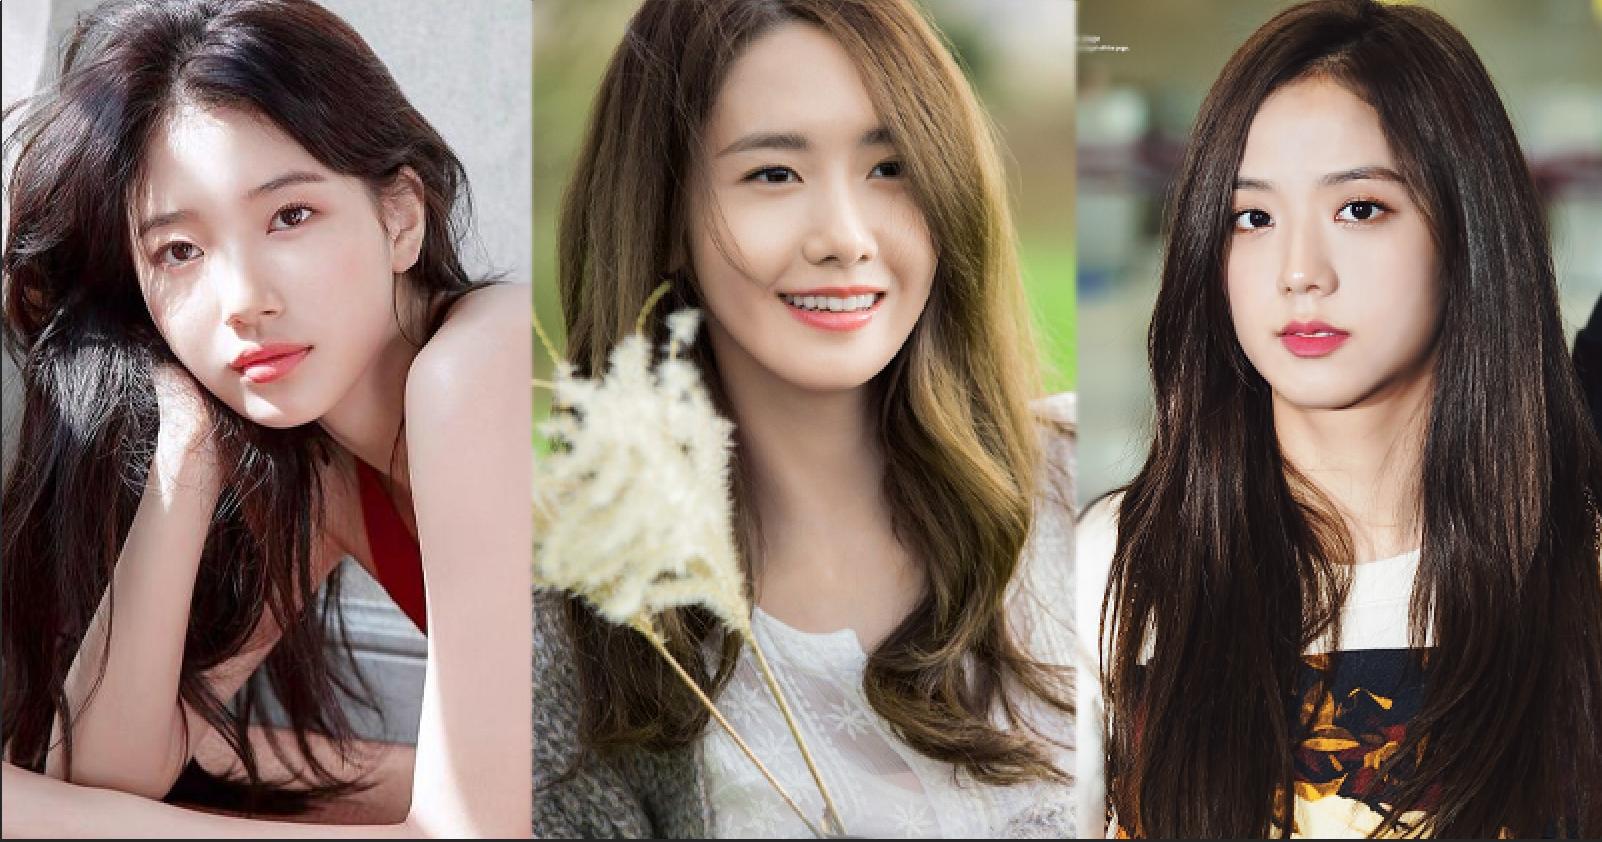 Female Idols Whose Visuals Best Represent The Big 3 K-Pop Companies